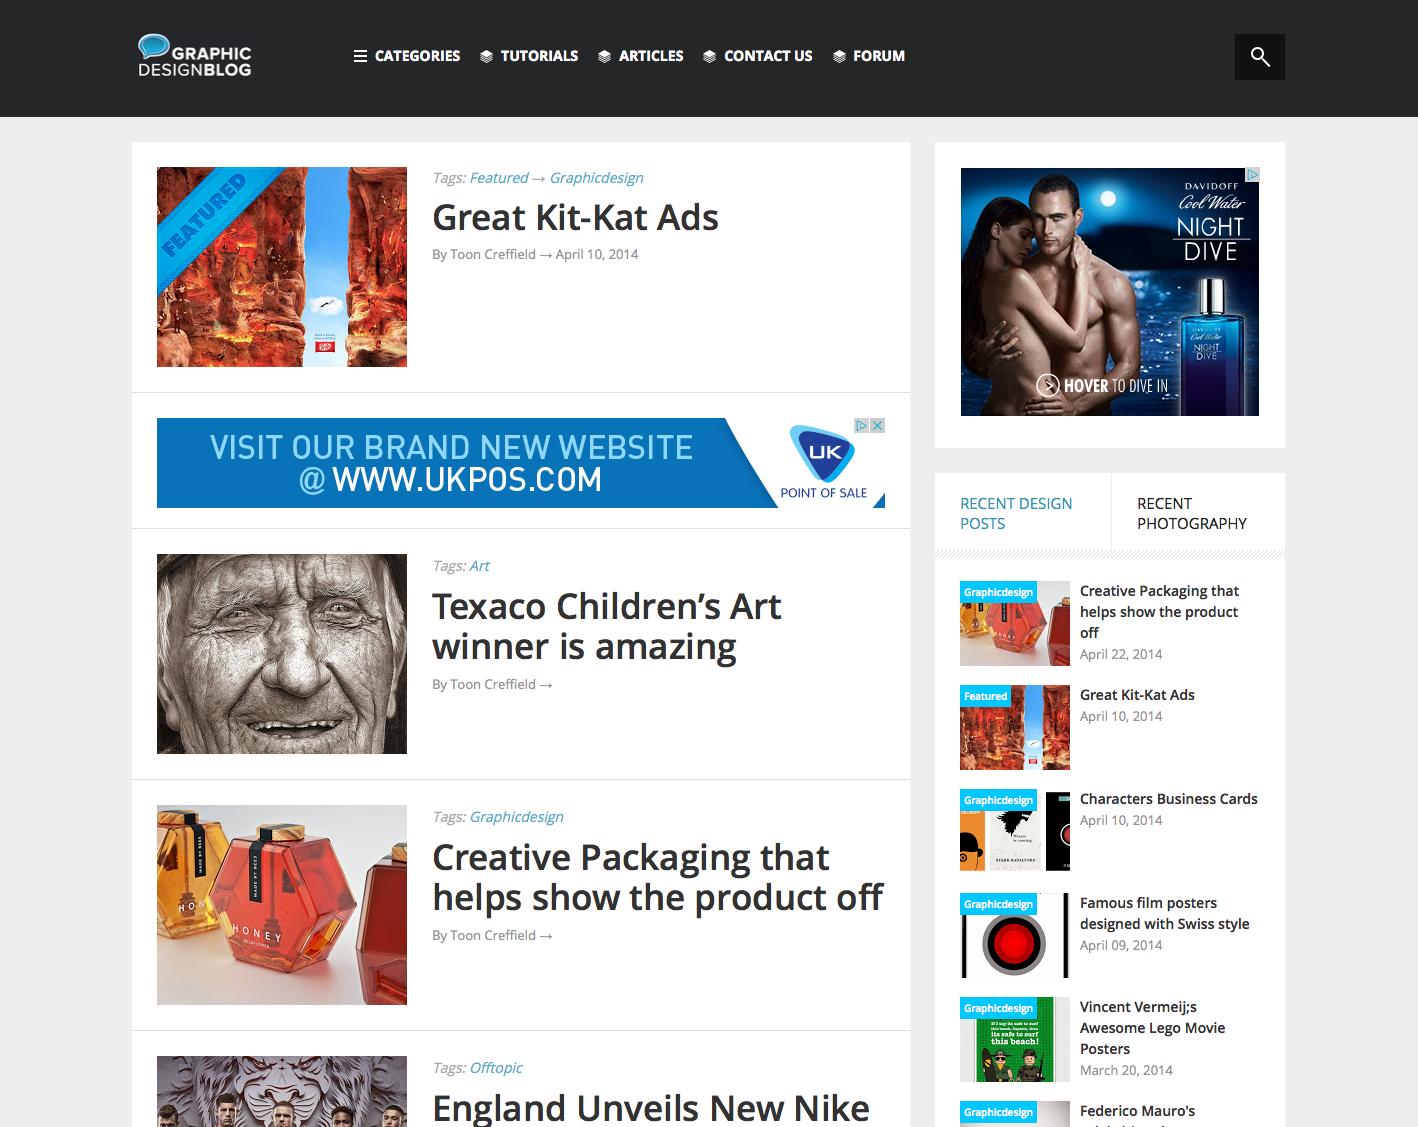 All new Graphic Design Blog